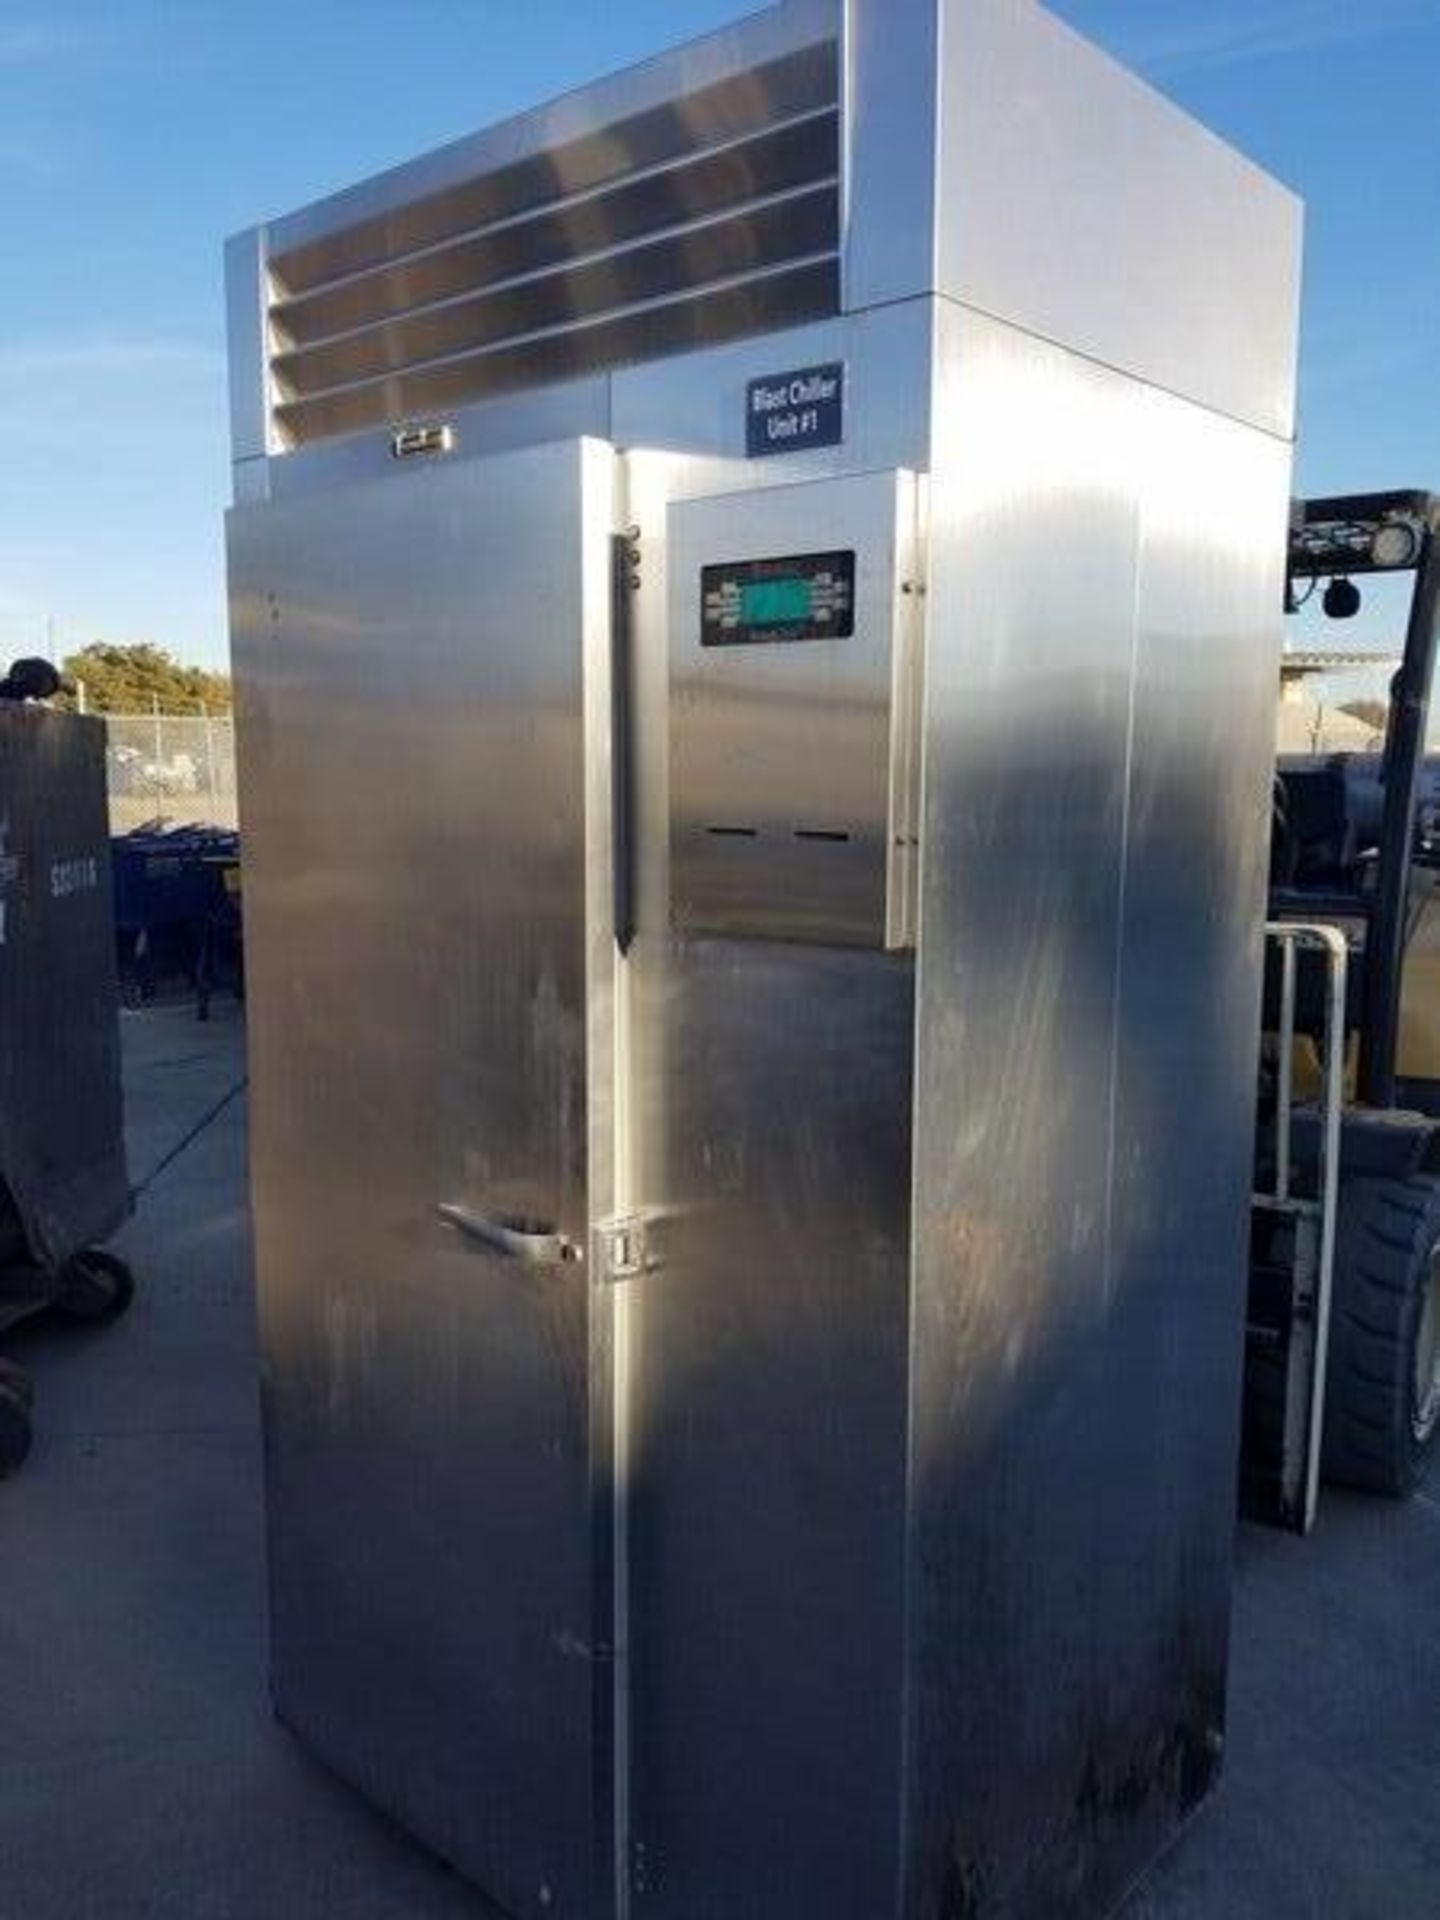 Lot 37 - Traulsen S/S Single Rack Blast Chiller, M/N RBC200-28, S/N T162475E11, Refrigerant 404A, Design